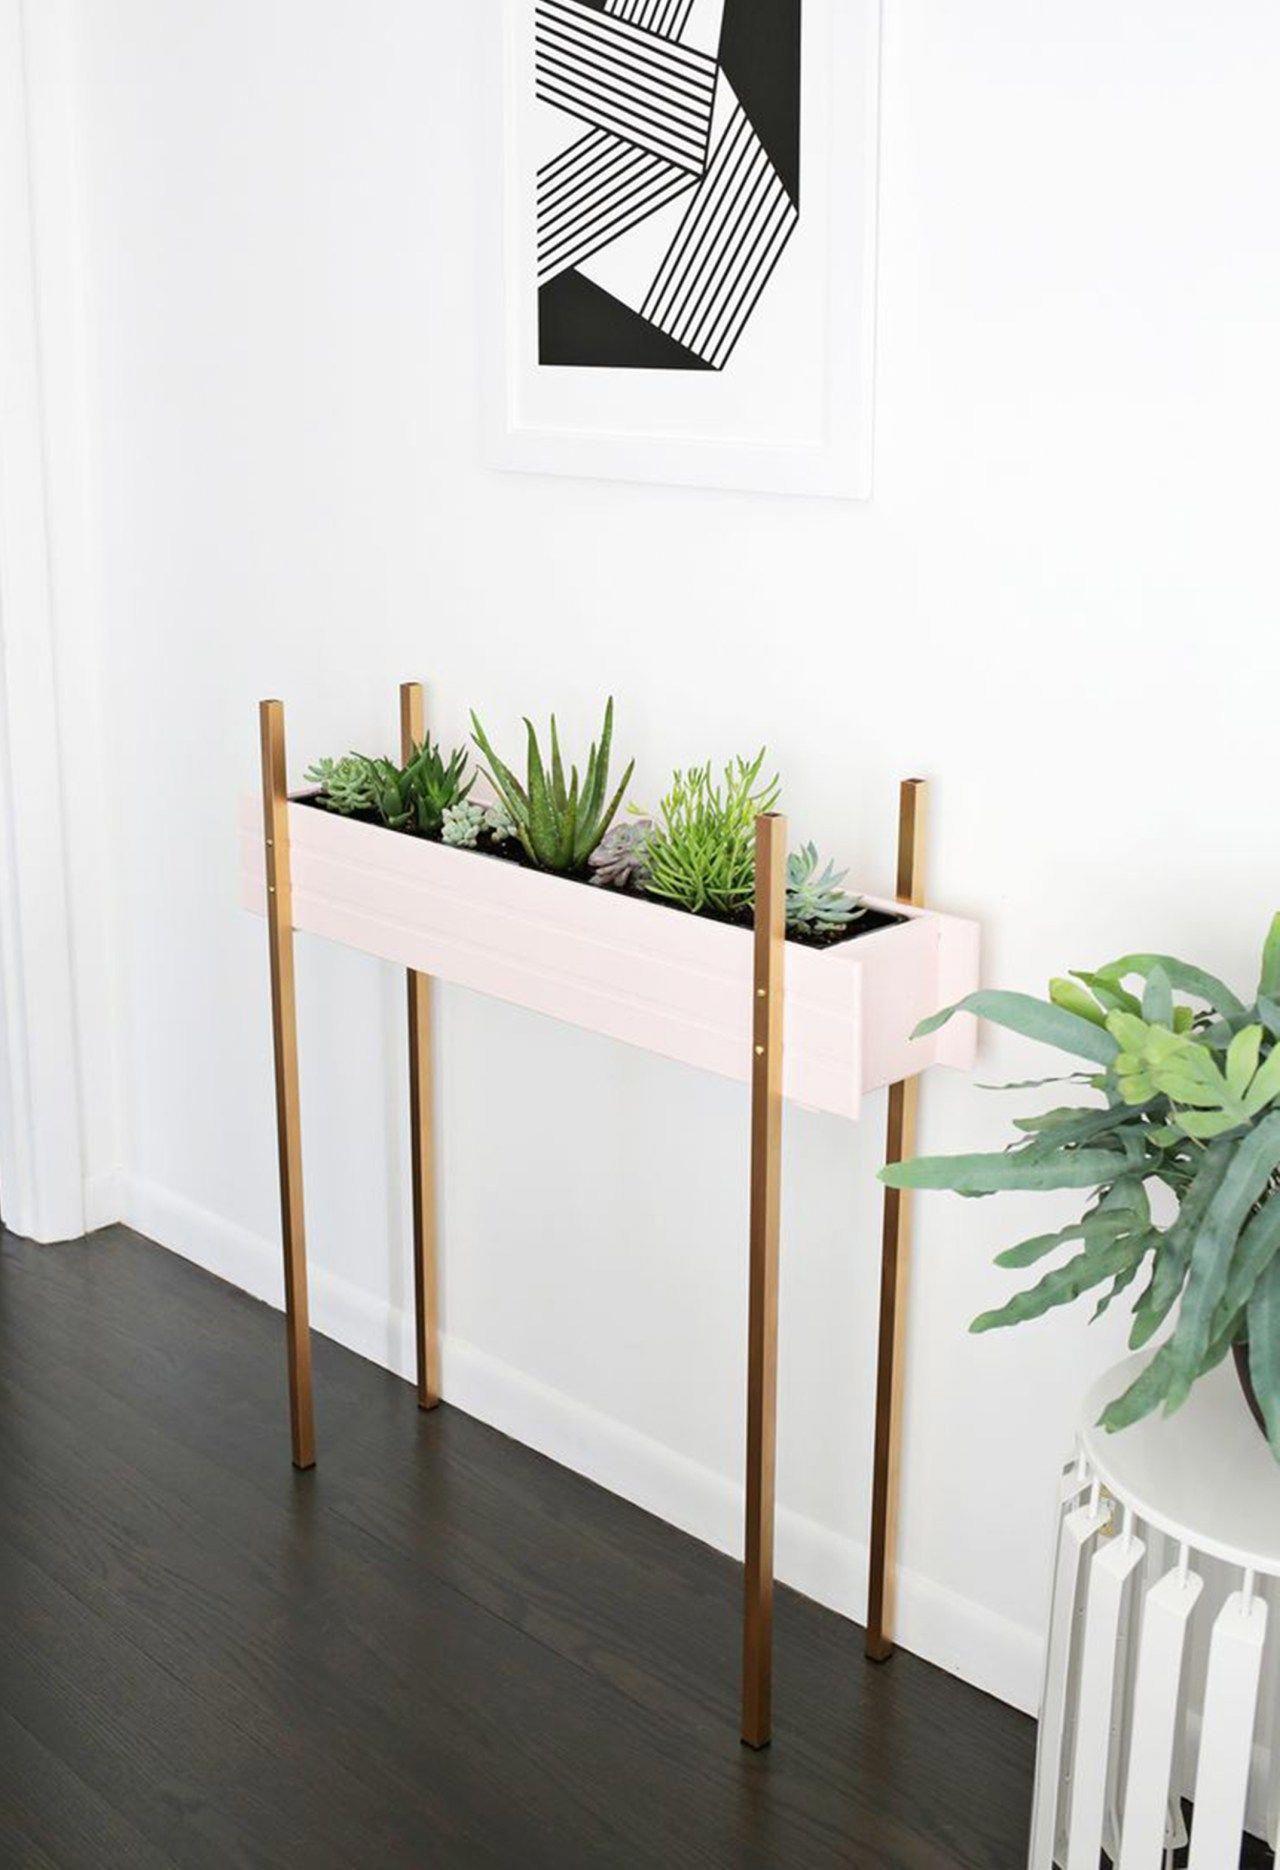 Scandinavian Design On A Budget Diy Ideas With Nordic Style Thatscandinavianfeeling Com Diy In 2020 Scandinavian Decor Diy Scandinavian Decor Scandinavian Interior